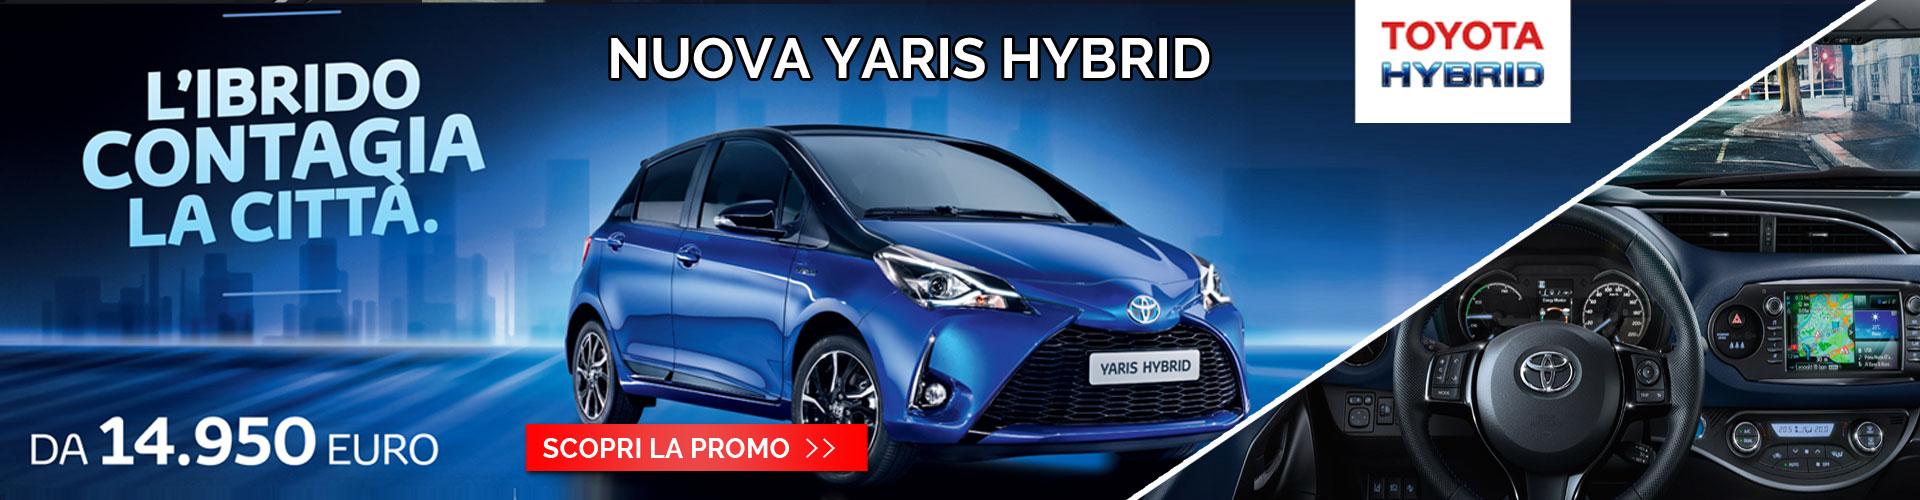 Promo Yaris Hybrid Toyota Torino